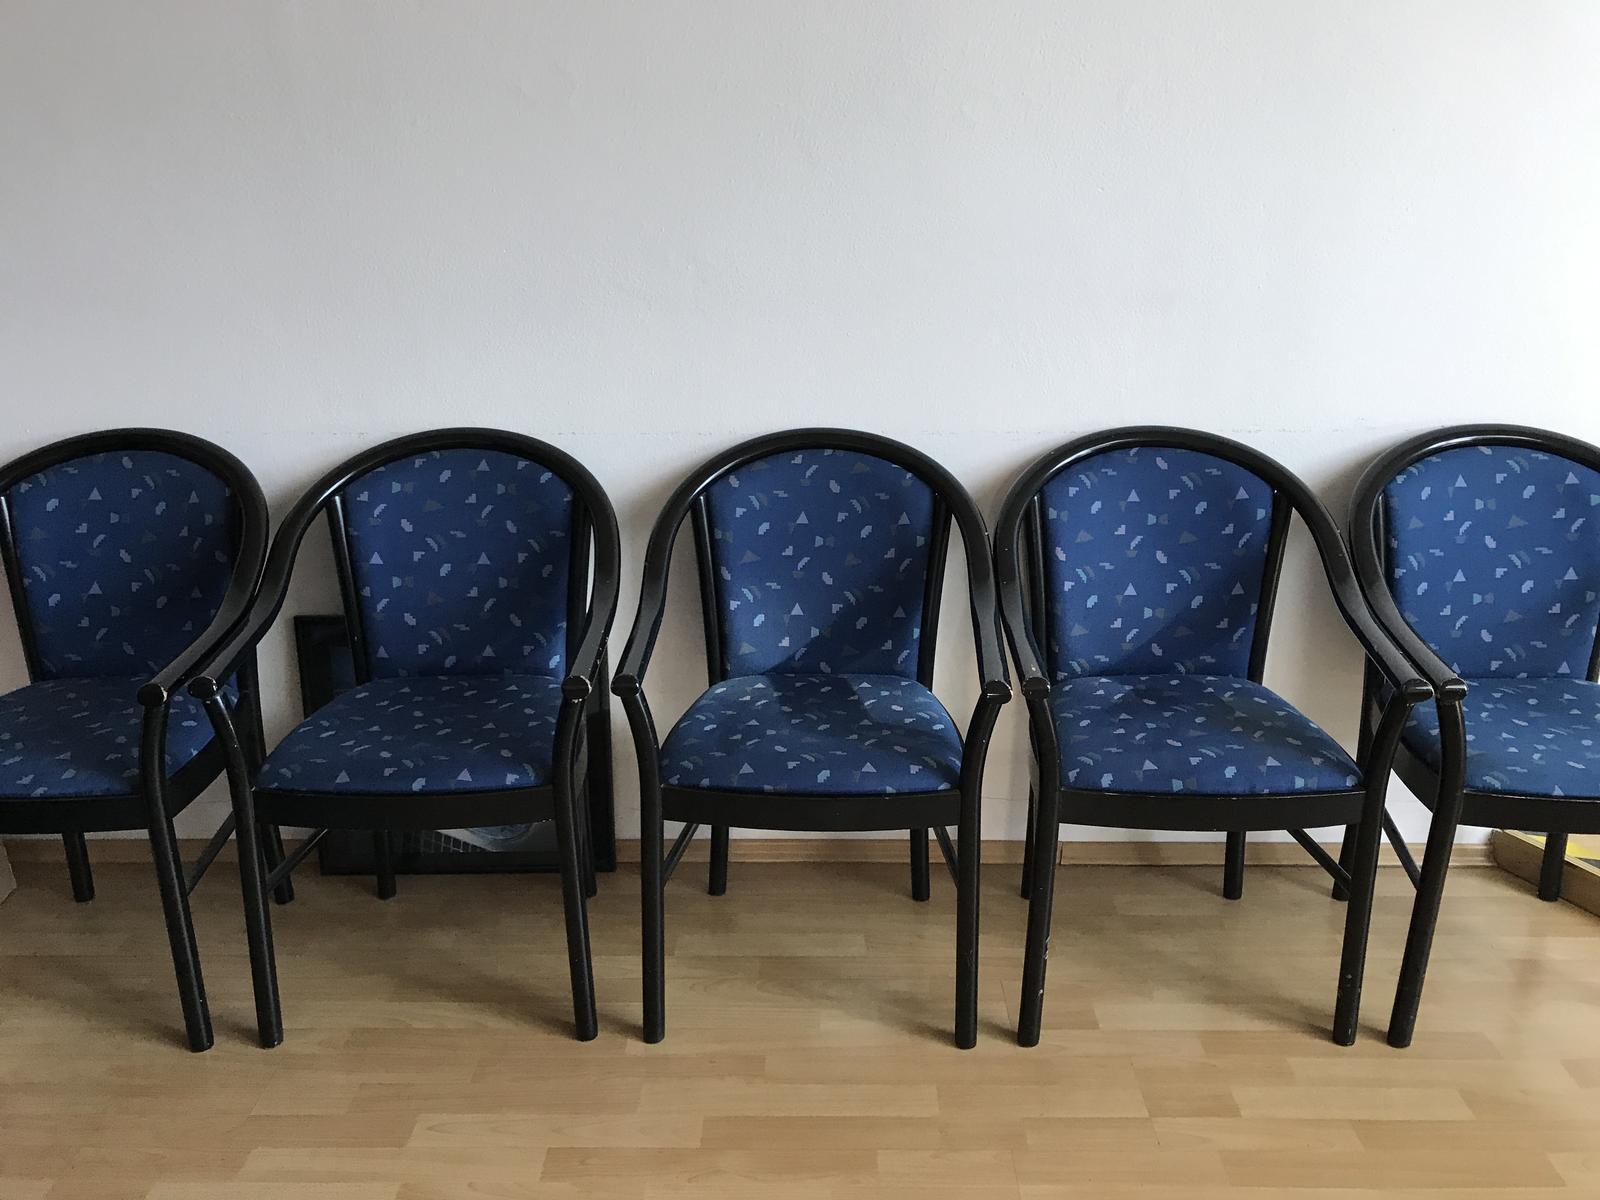 5x stolička - Obrázok č. 1